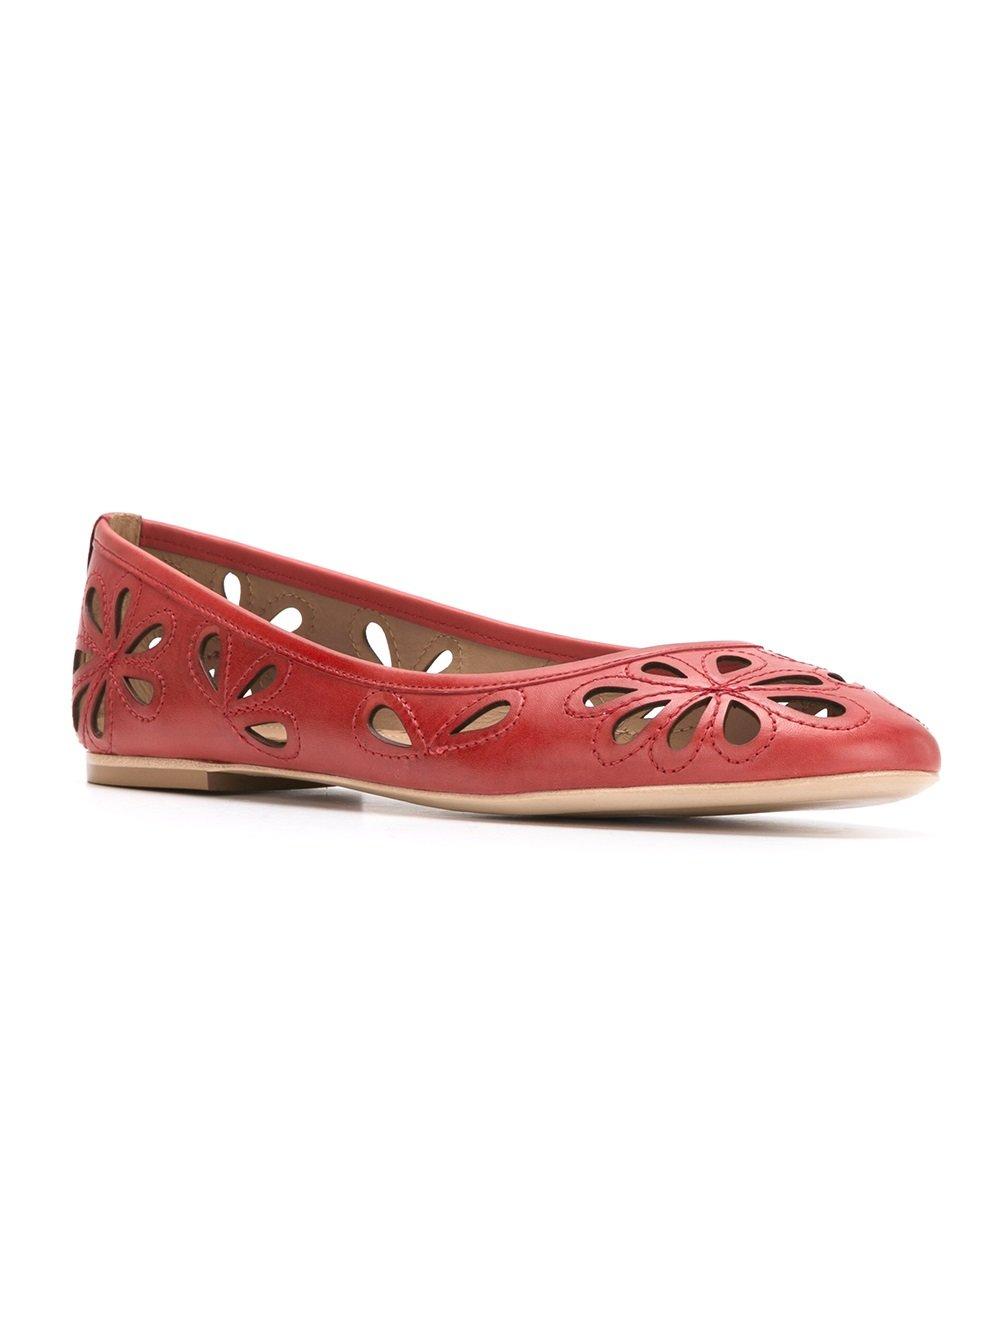 Sarah Chofakian leather ballerinas - Red